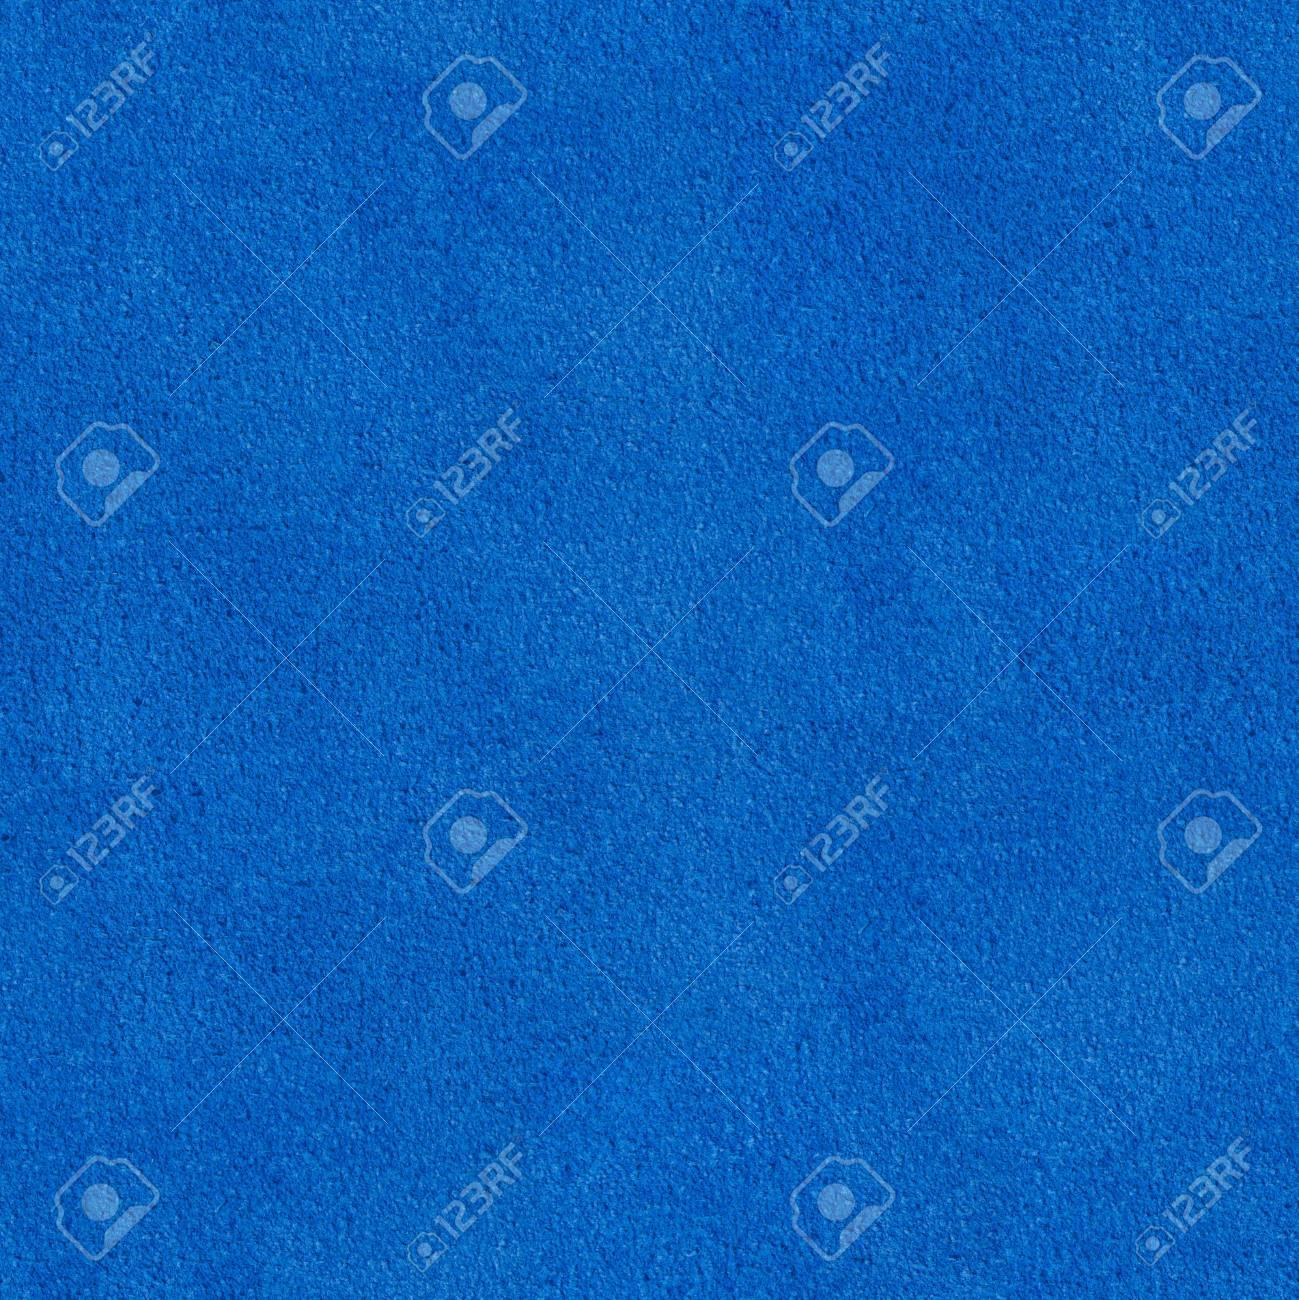 blue velvet texture. Blue Velvet For Background Usage. Seamless Square Texture, Tile Ready. High Resolution Photo Texture